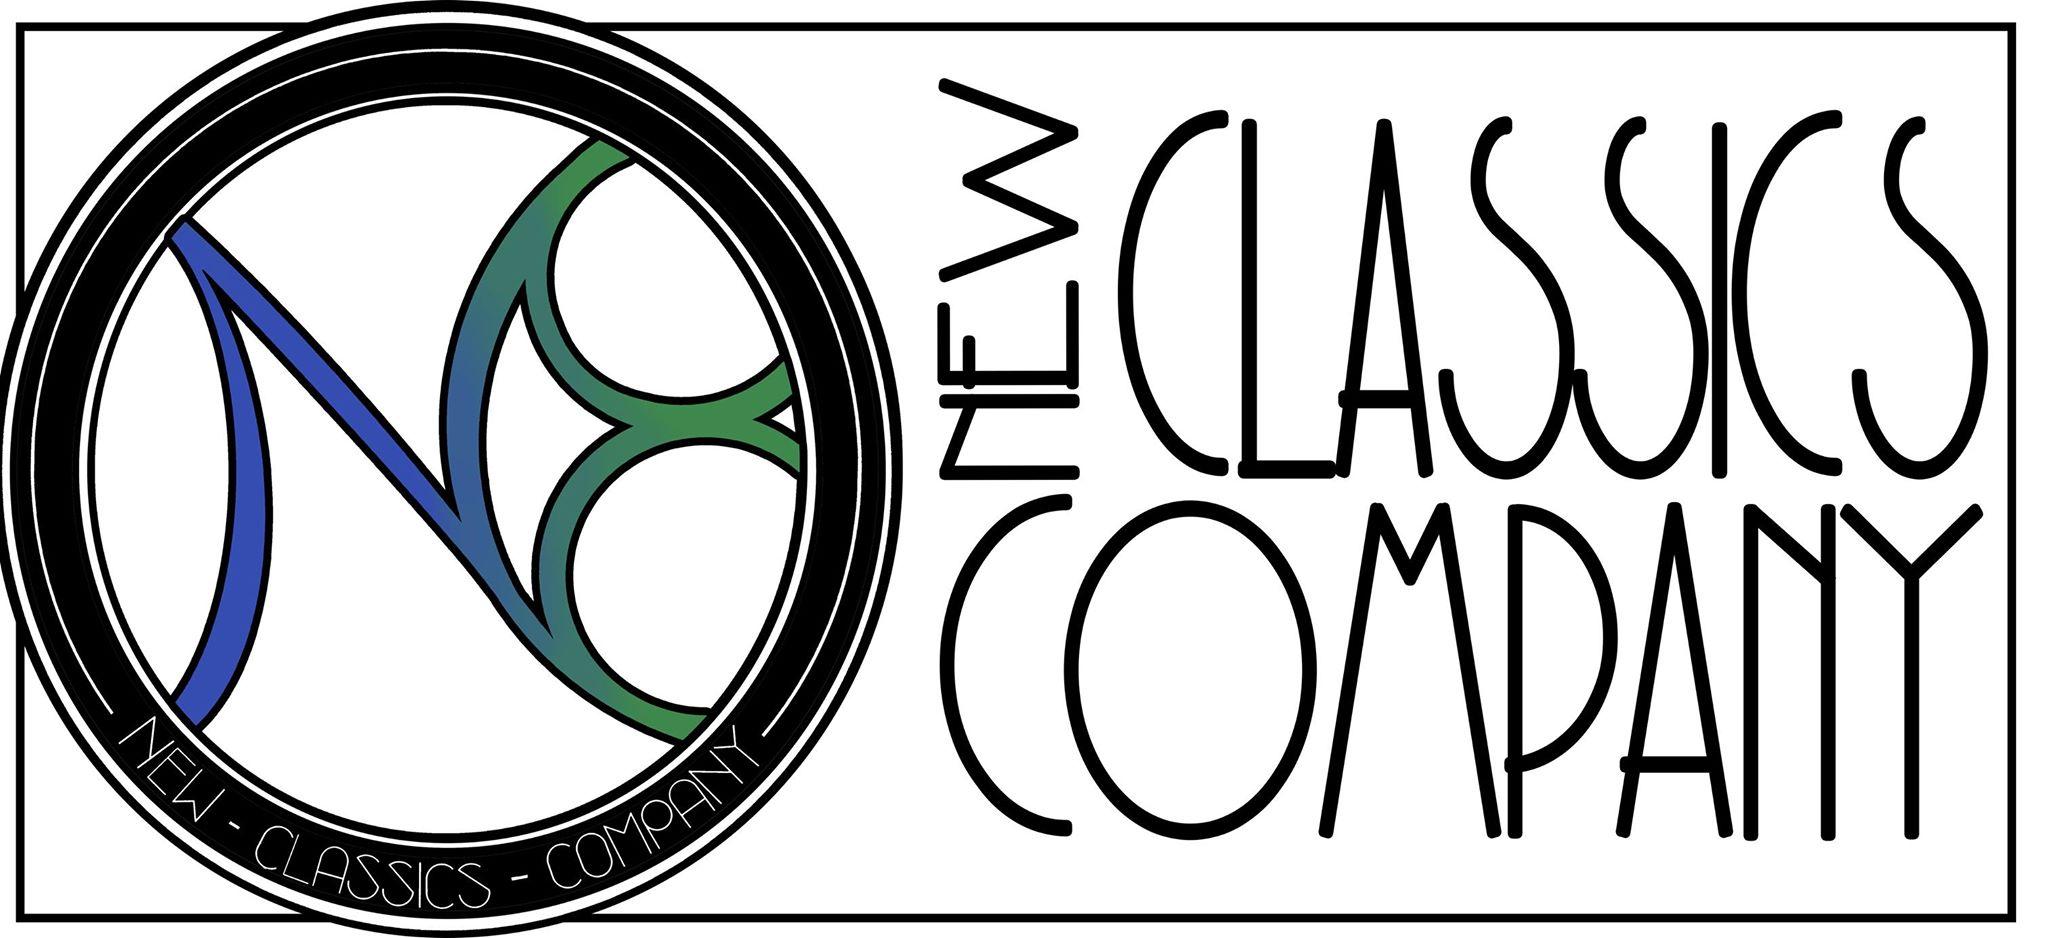 Ep. 5 5th Year Celebration – The New Classics Company